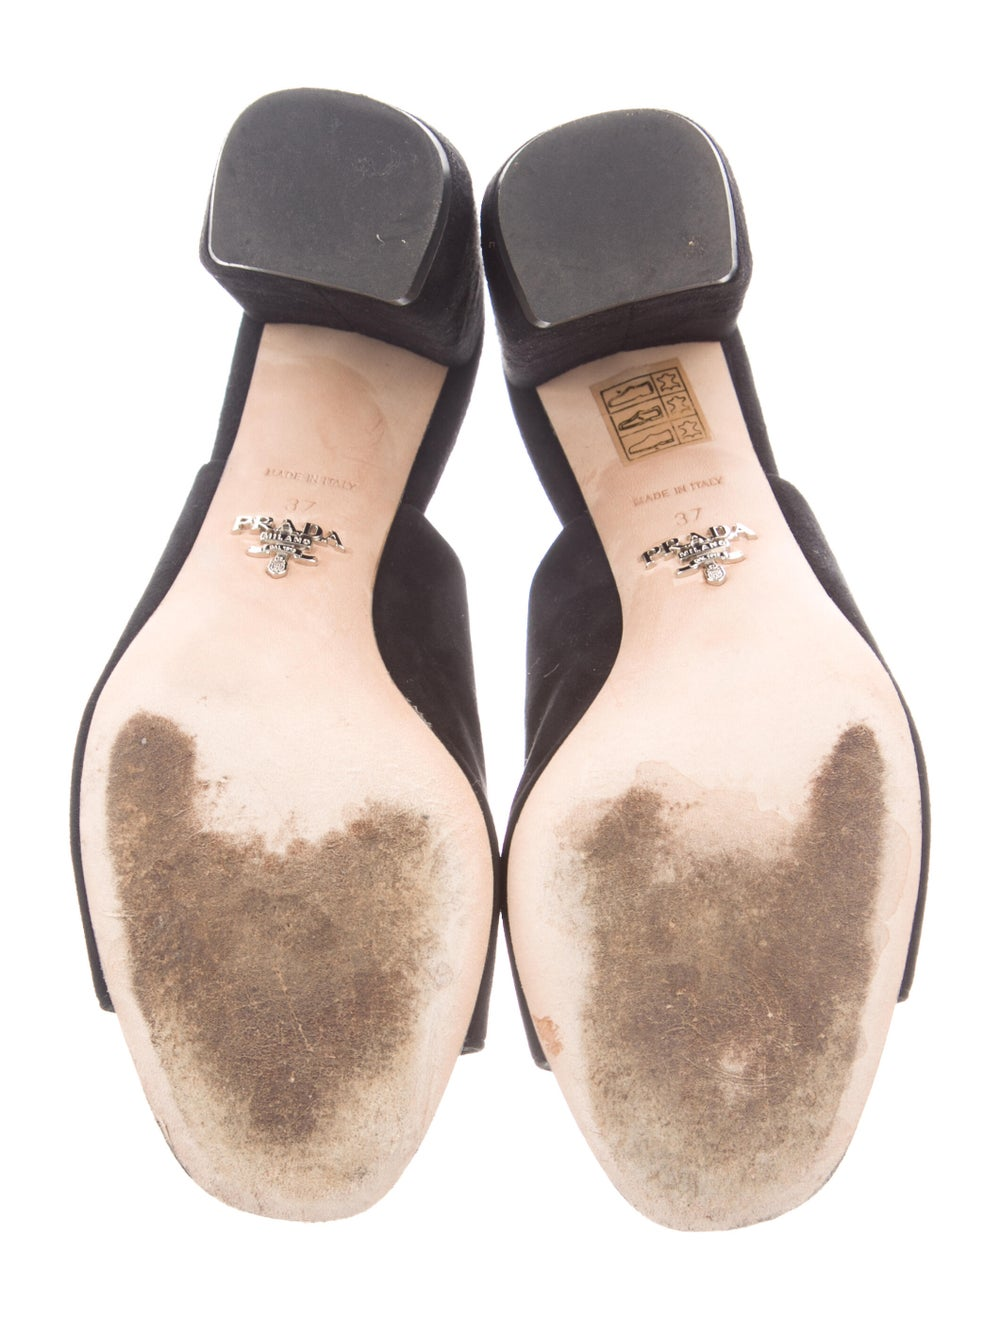 Prada Suede Slingback Sandals Black - image 5